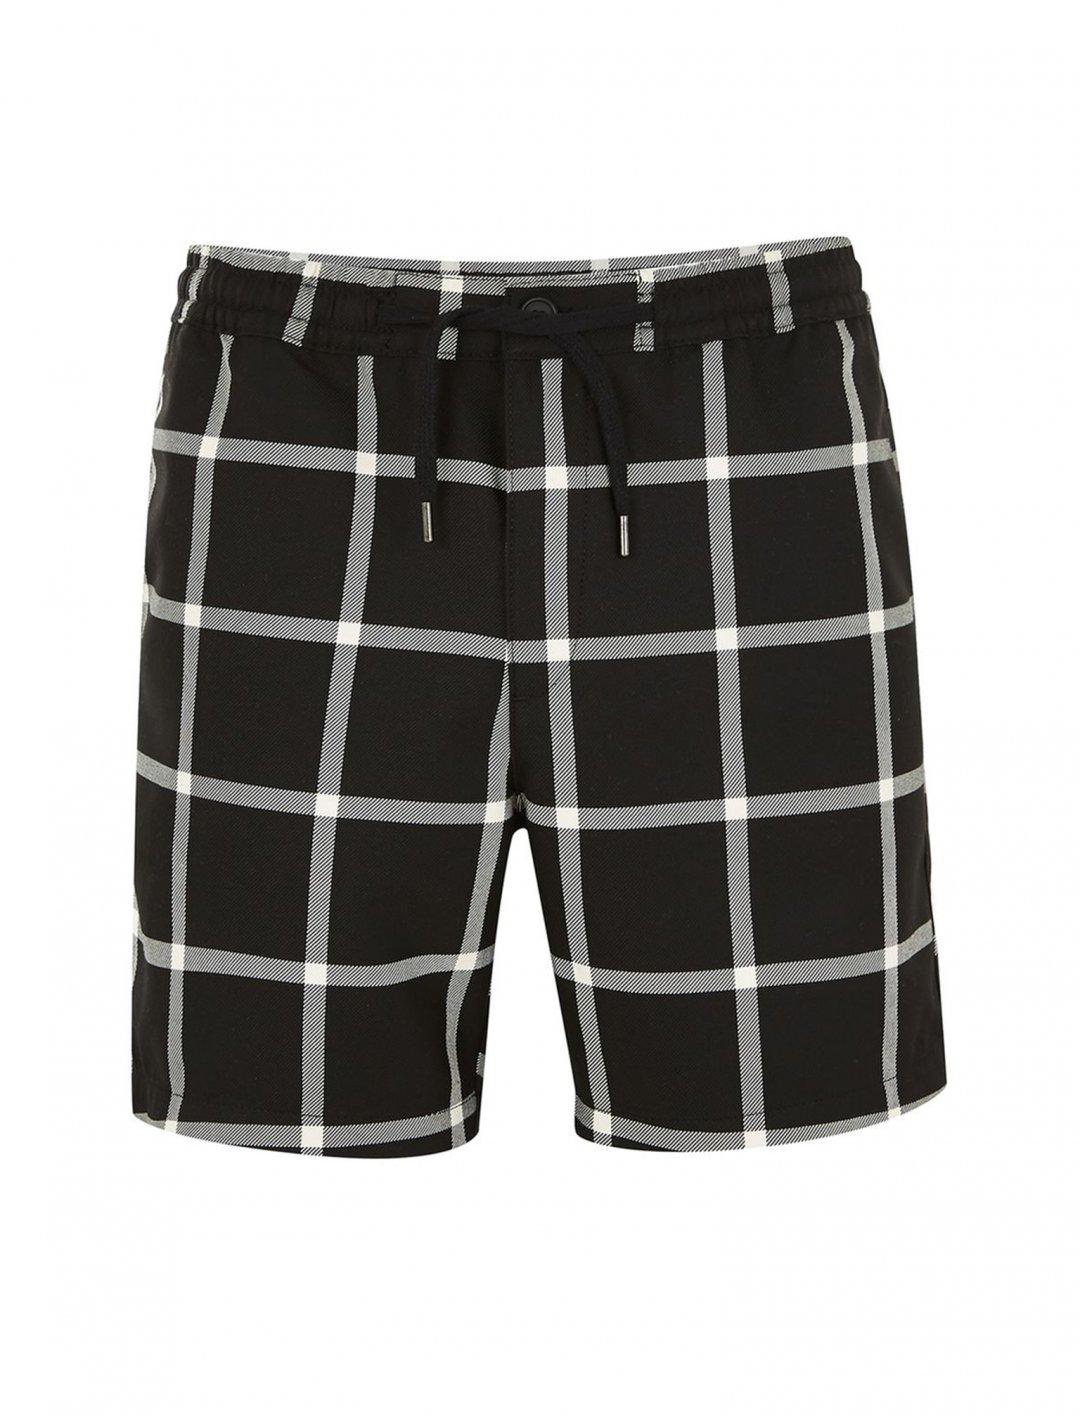 "Topman Black Windowpane Shorts {""id"":5,""product_section_id"":1,""name"":""Clothing"",""order"":5} Topman"